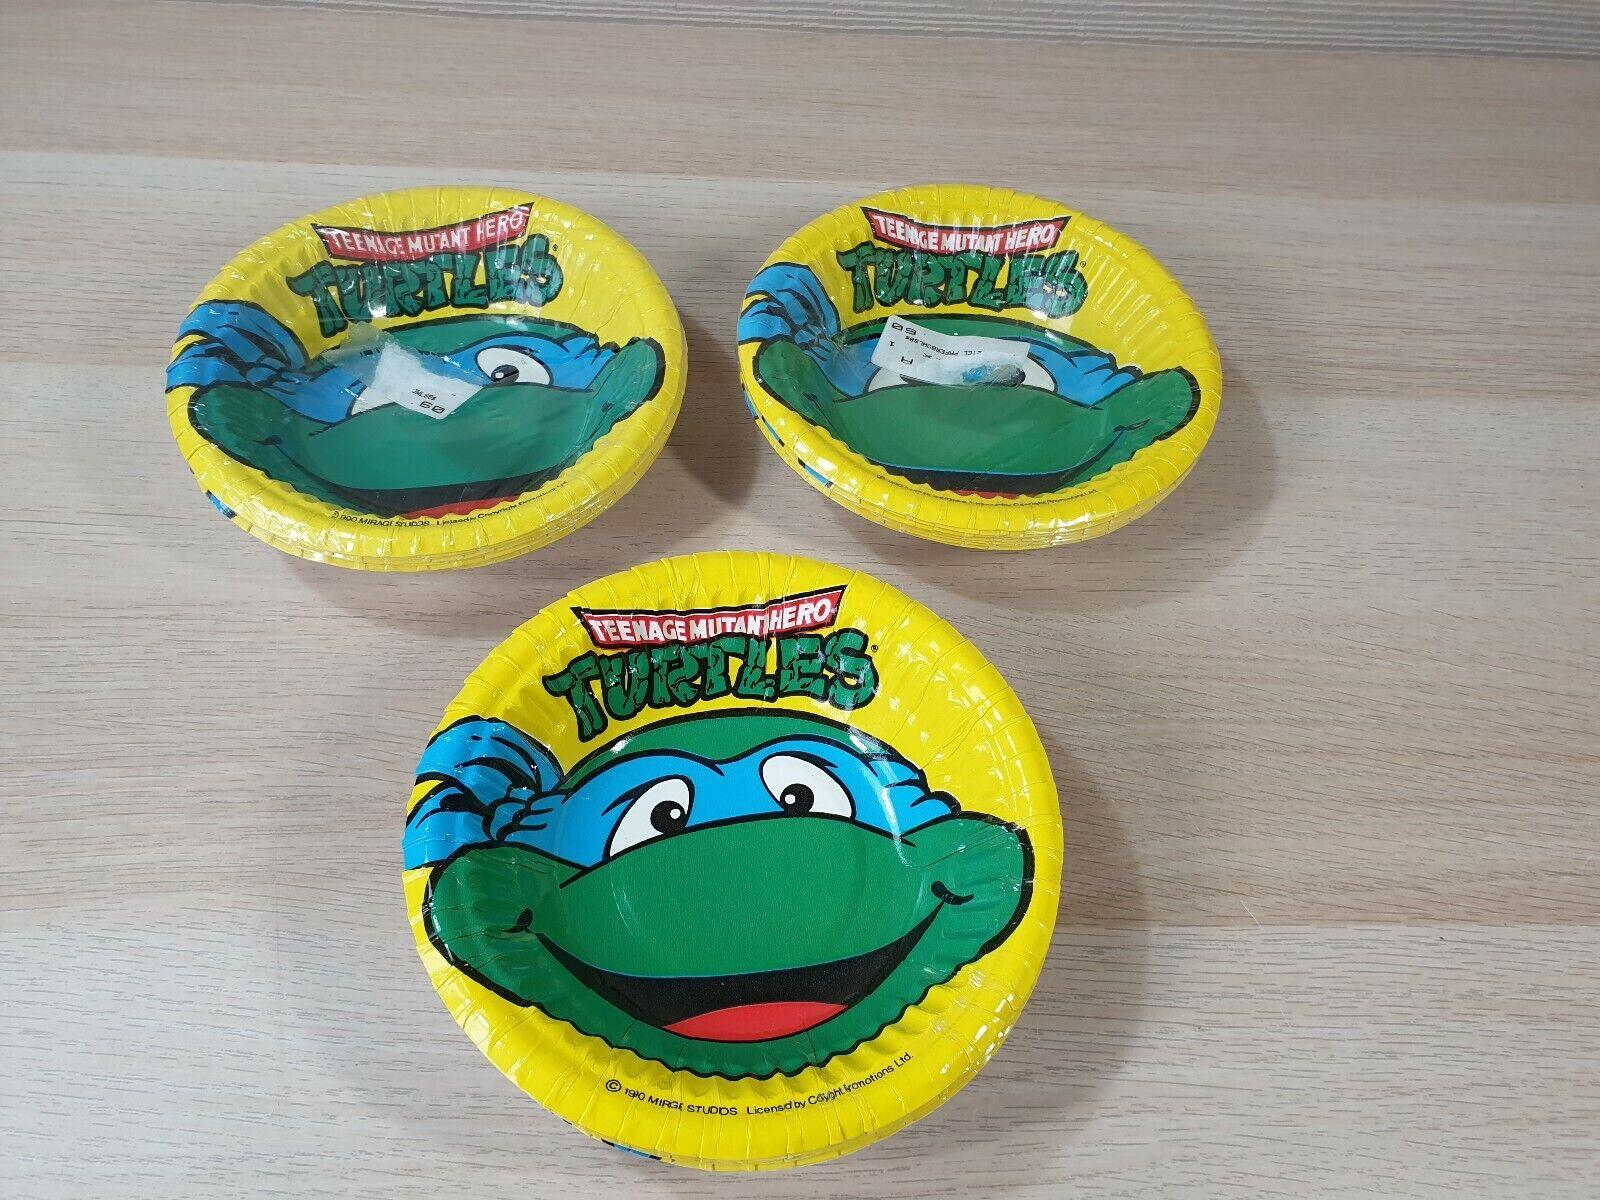 24x 24x 24x Teenage Mutant Hero Turtles Vintage Birthday Party Paper Bowls 1990 NEW RARE 409c2b